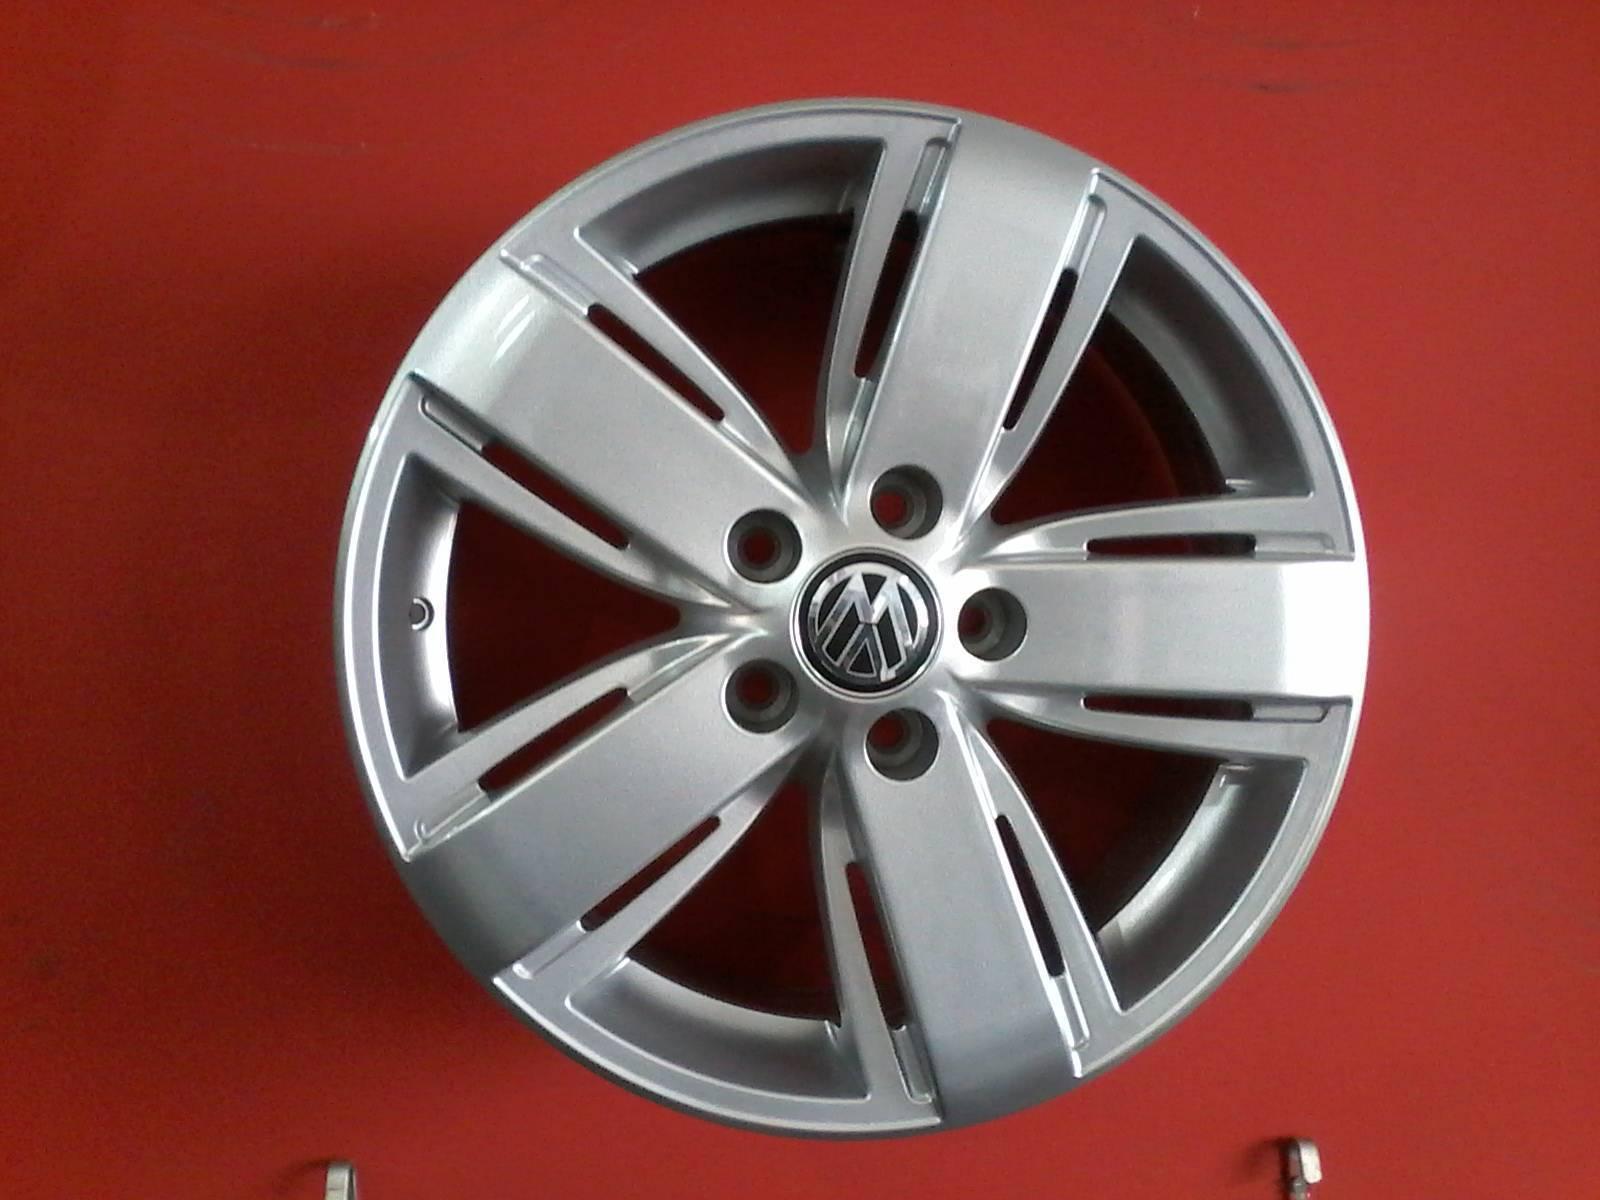 Jogo de Roda Replica Volkswagen Aro 18 5X120 ET 37- Replica Amarok